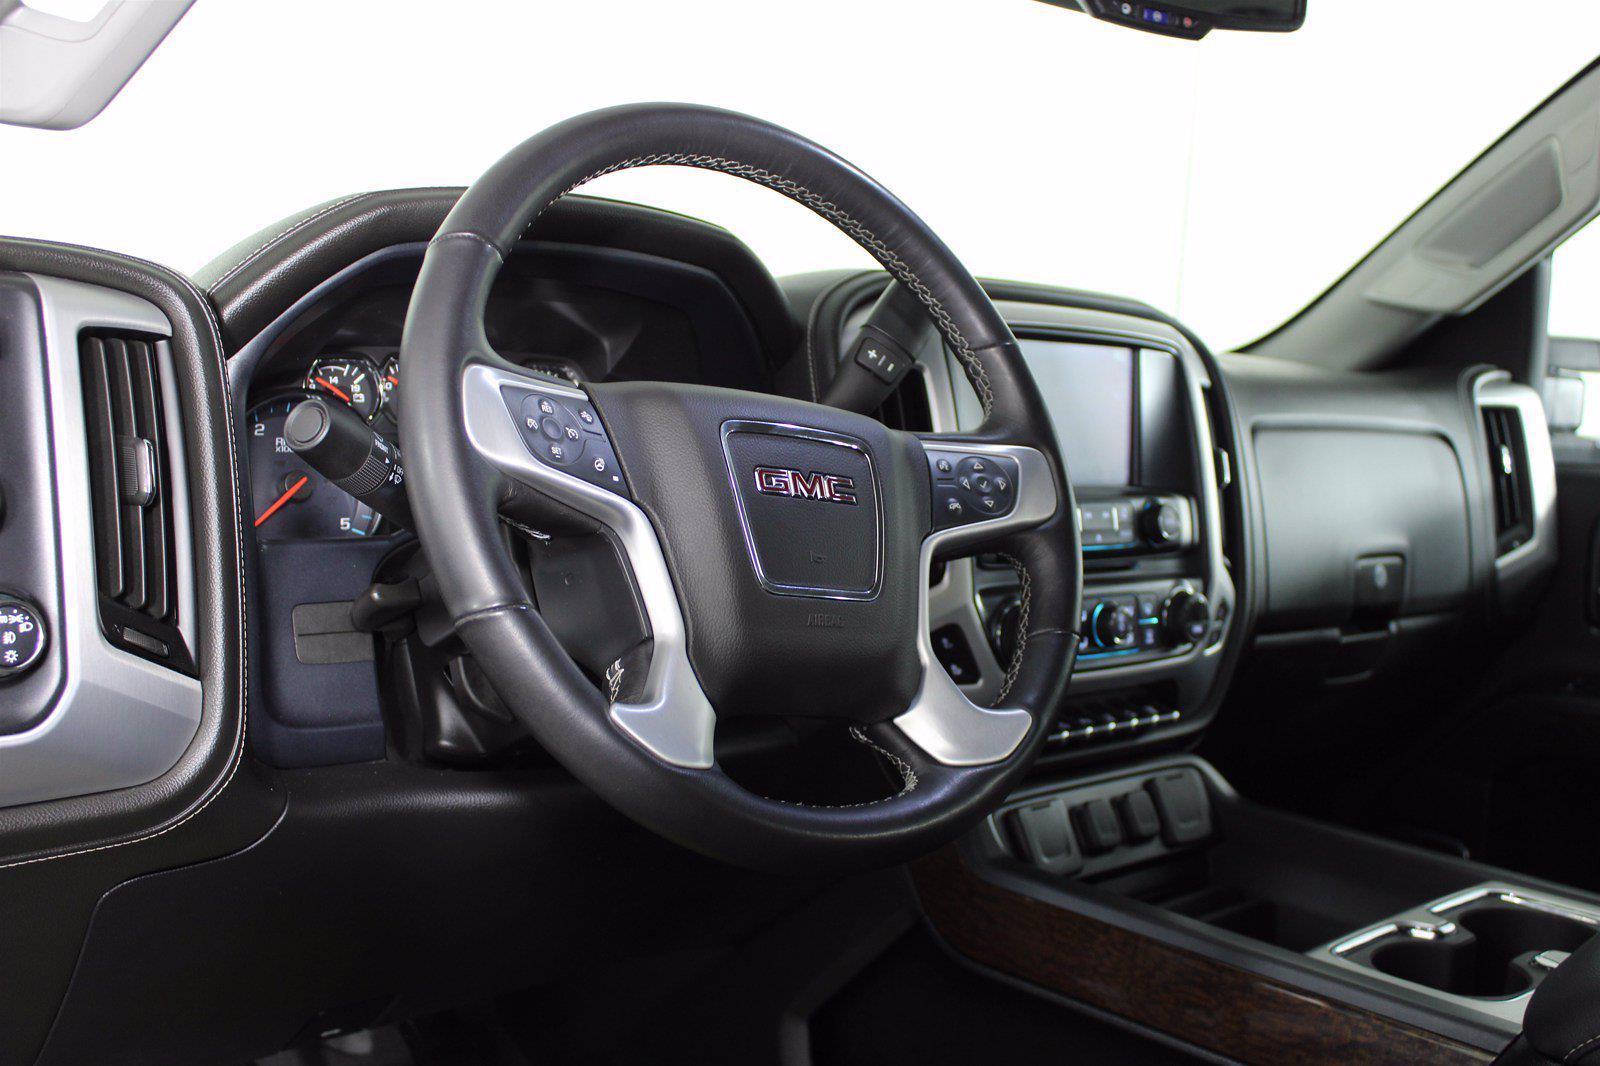 2019 GMC Sierra 3500 Crew Cab 4x4, Pickup #DAG0049 - photo 10